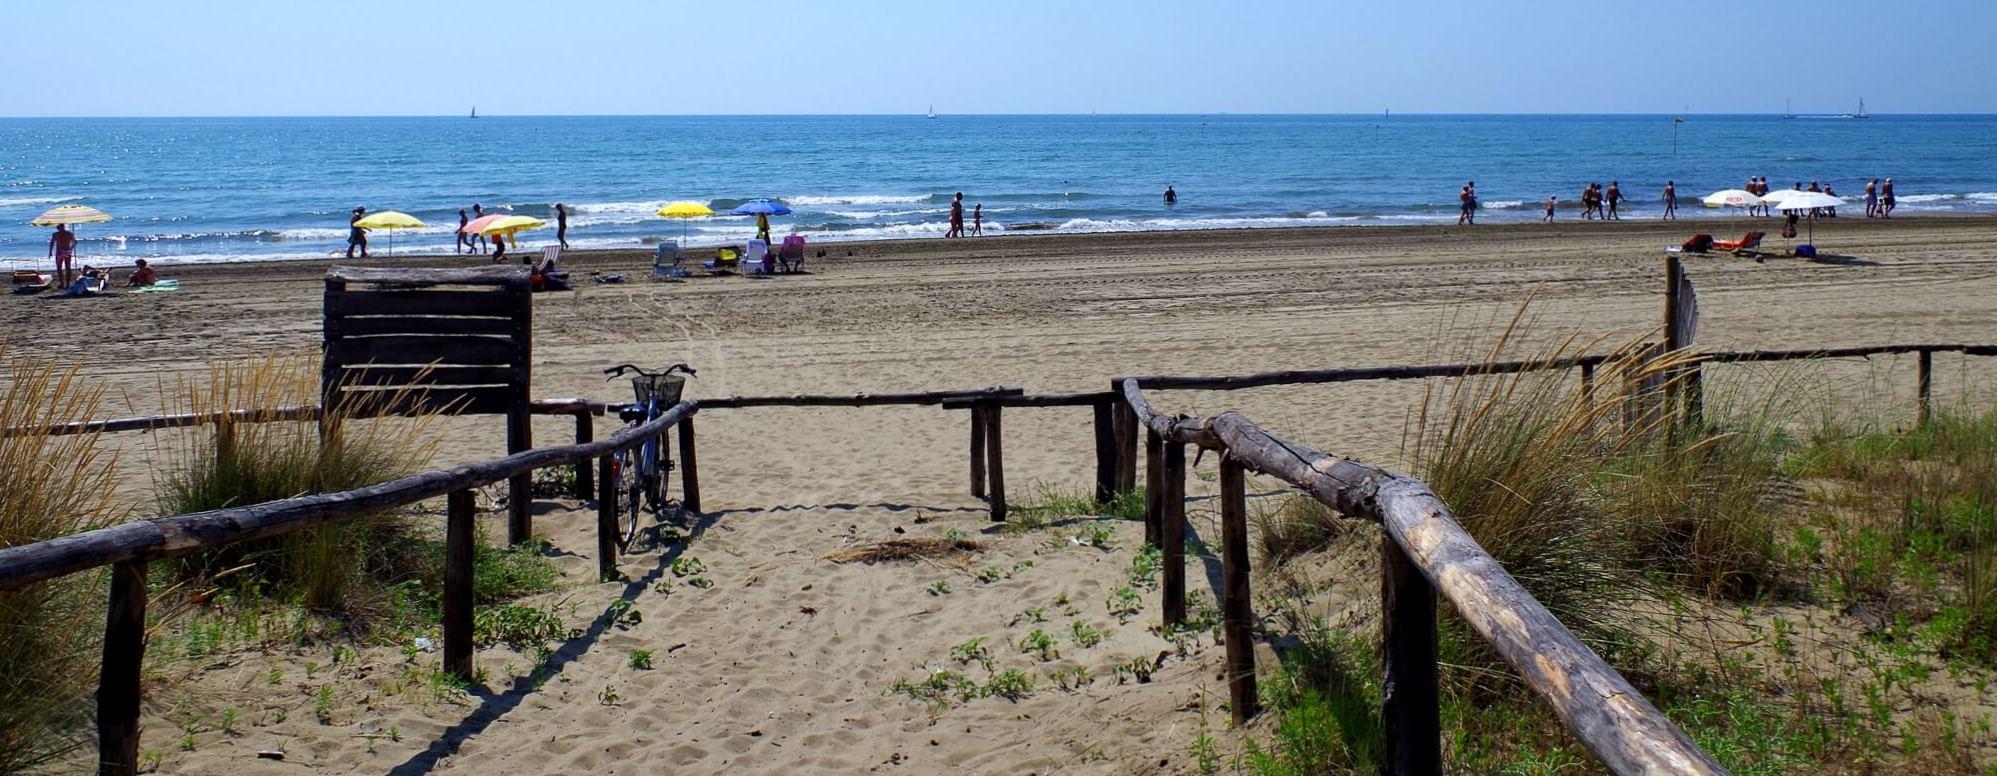 ca savio spiaggia